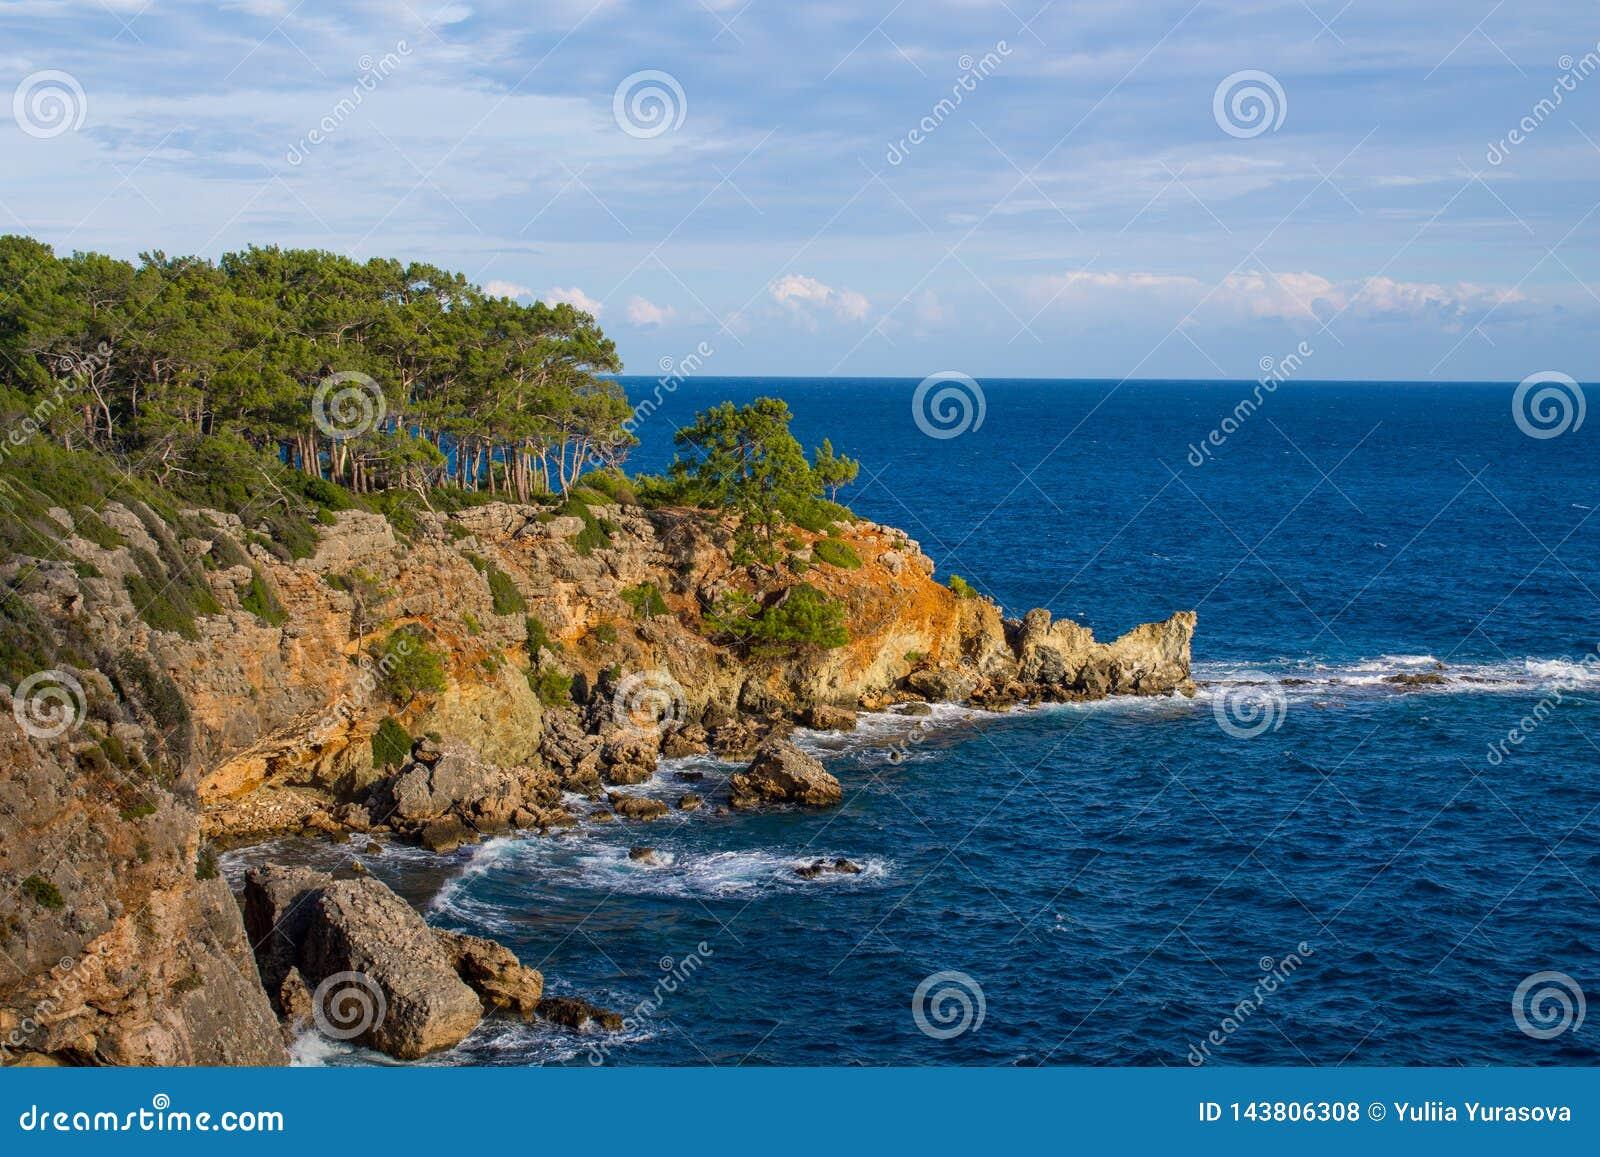 Beautiful rocky steep coast and big waves